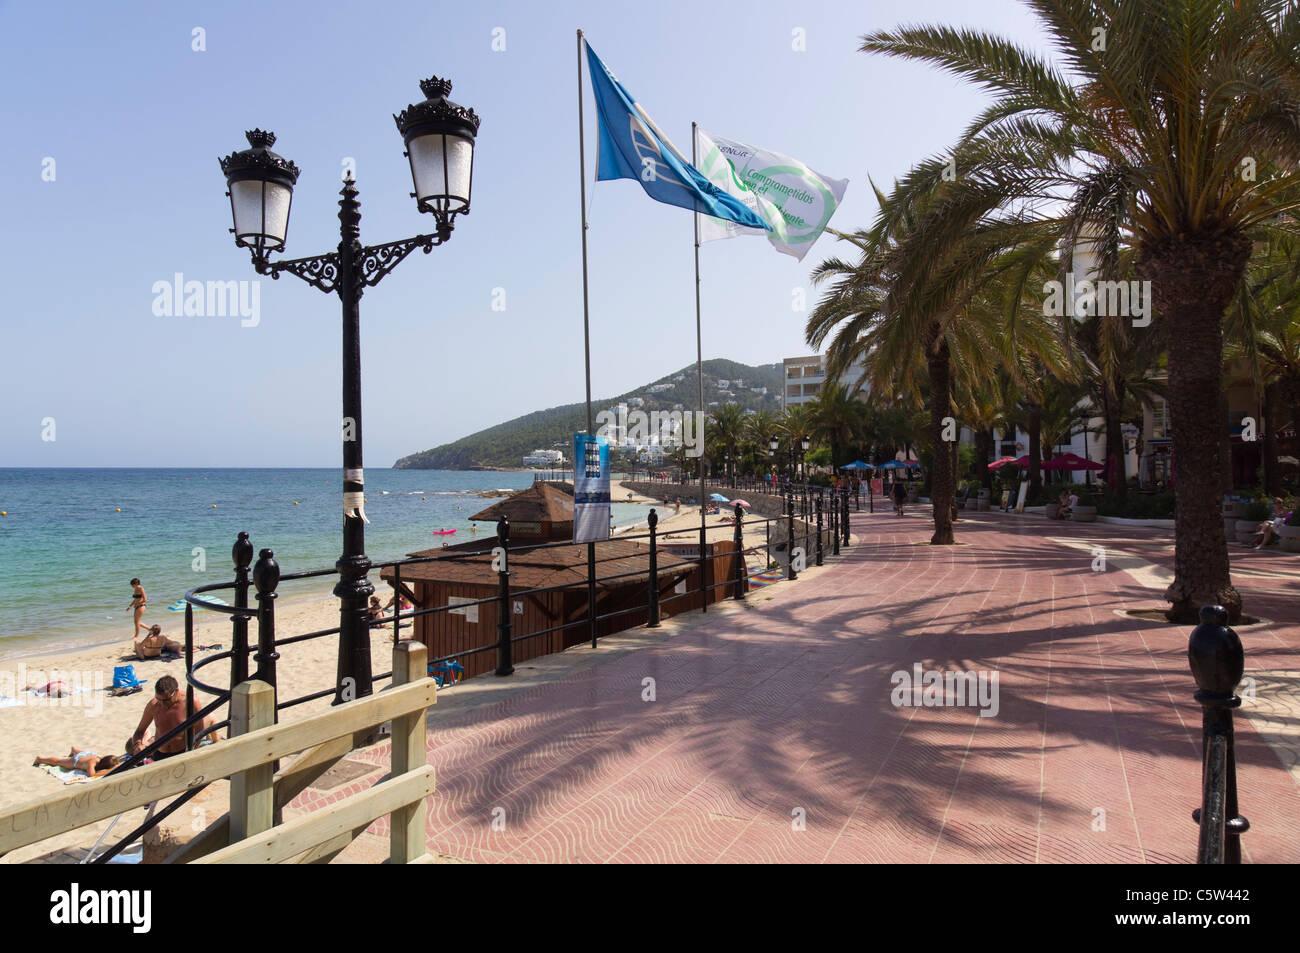 Ibiza, Balearics, Spain - Santa Eularia, beach resort on the east coast. Promenade. - Stock Image